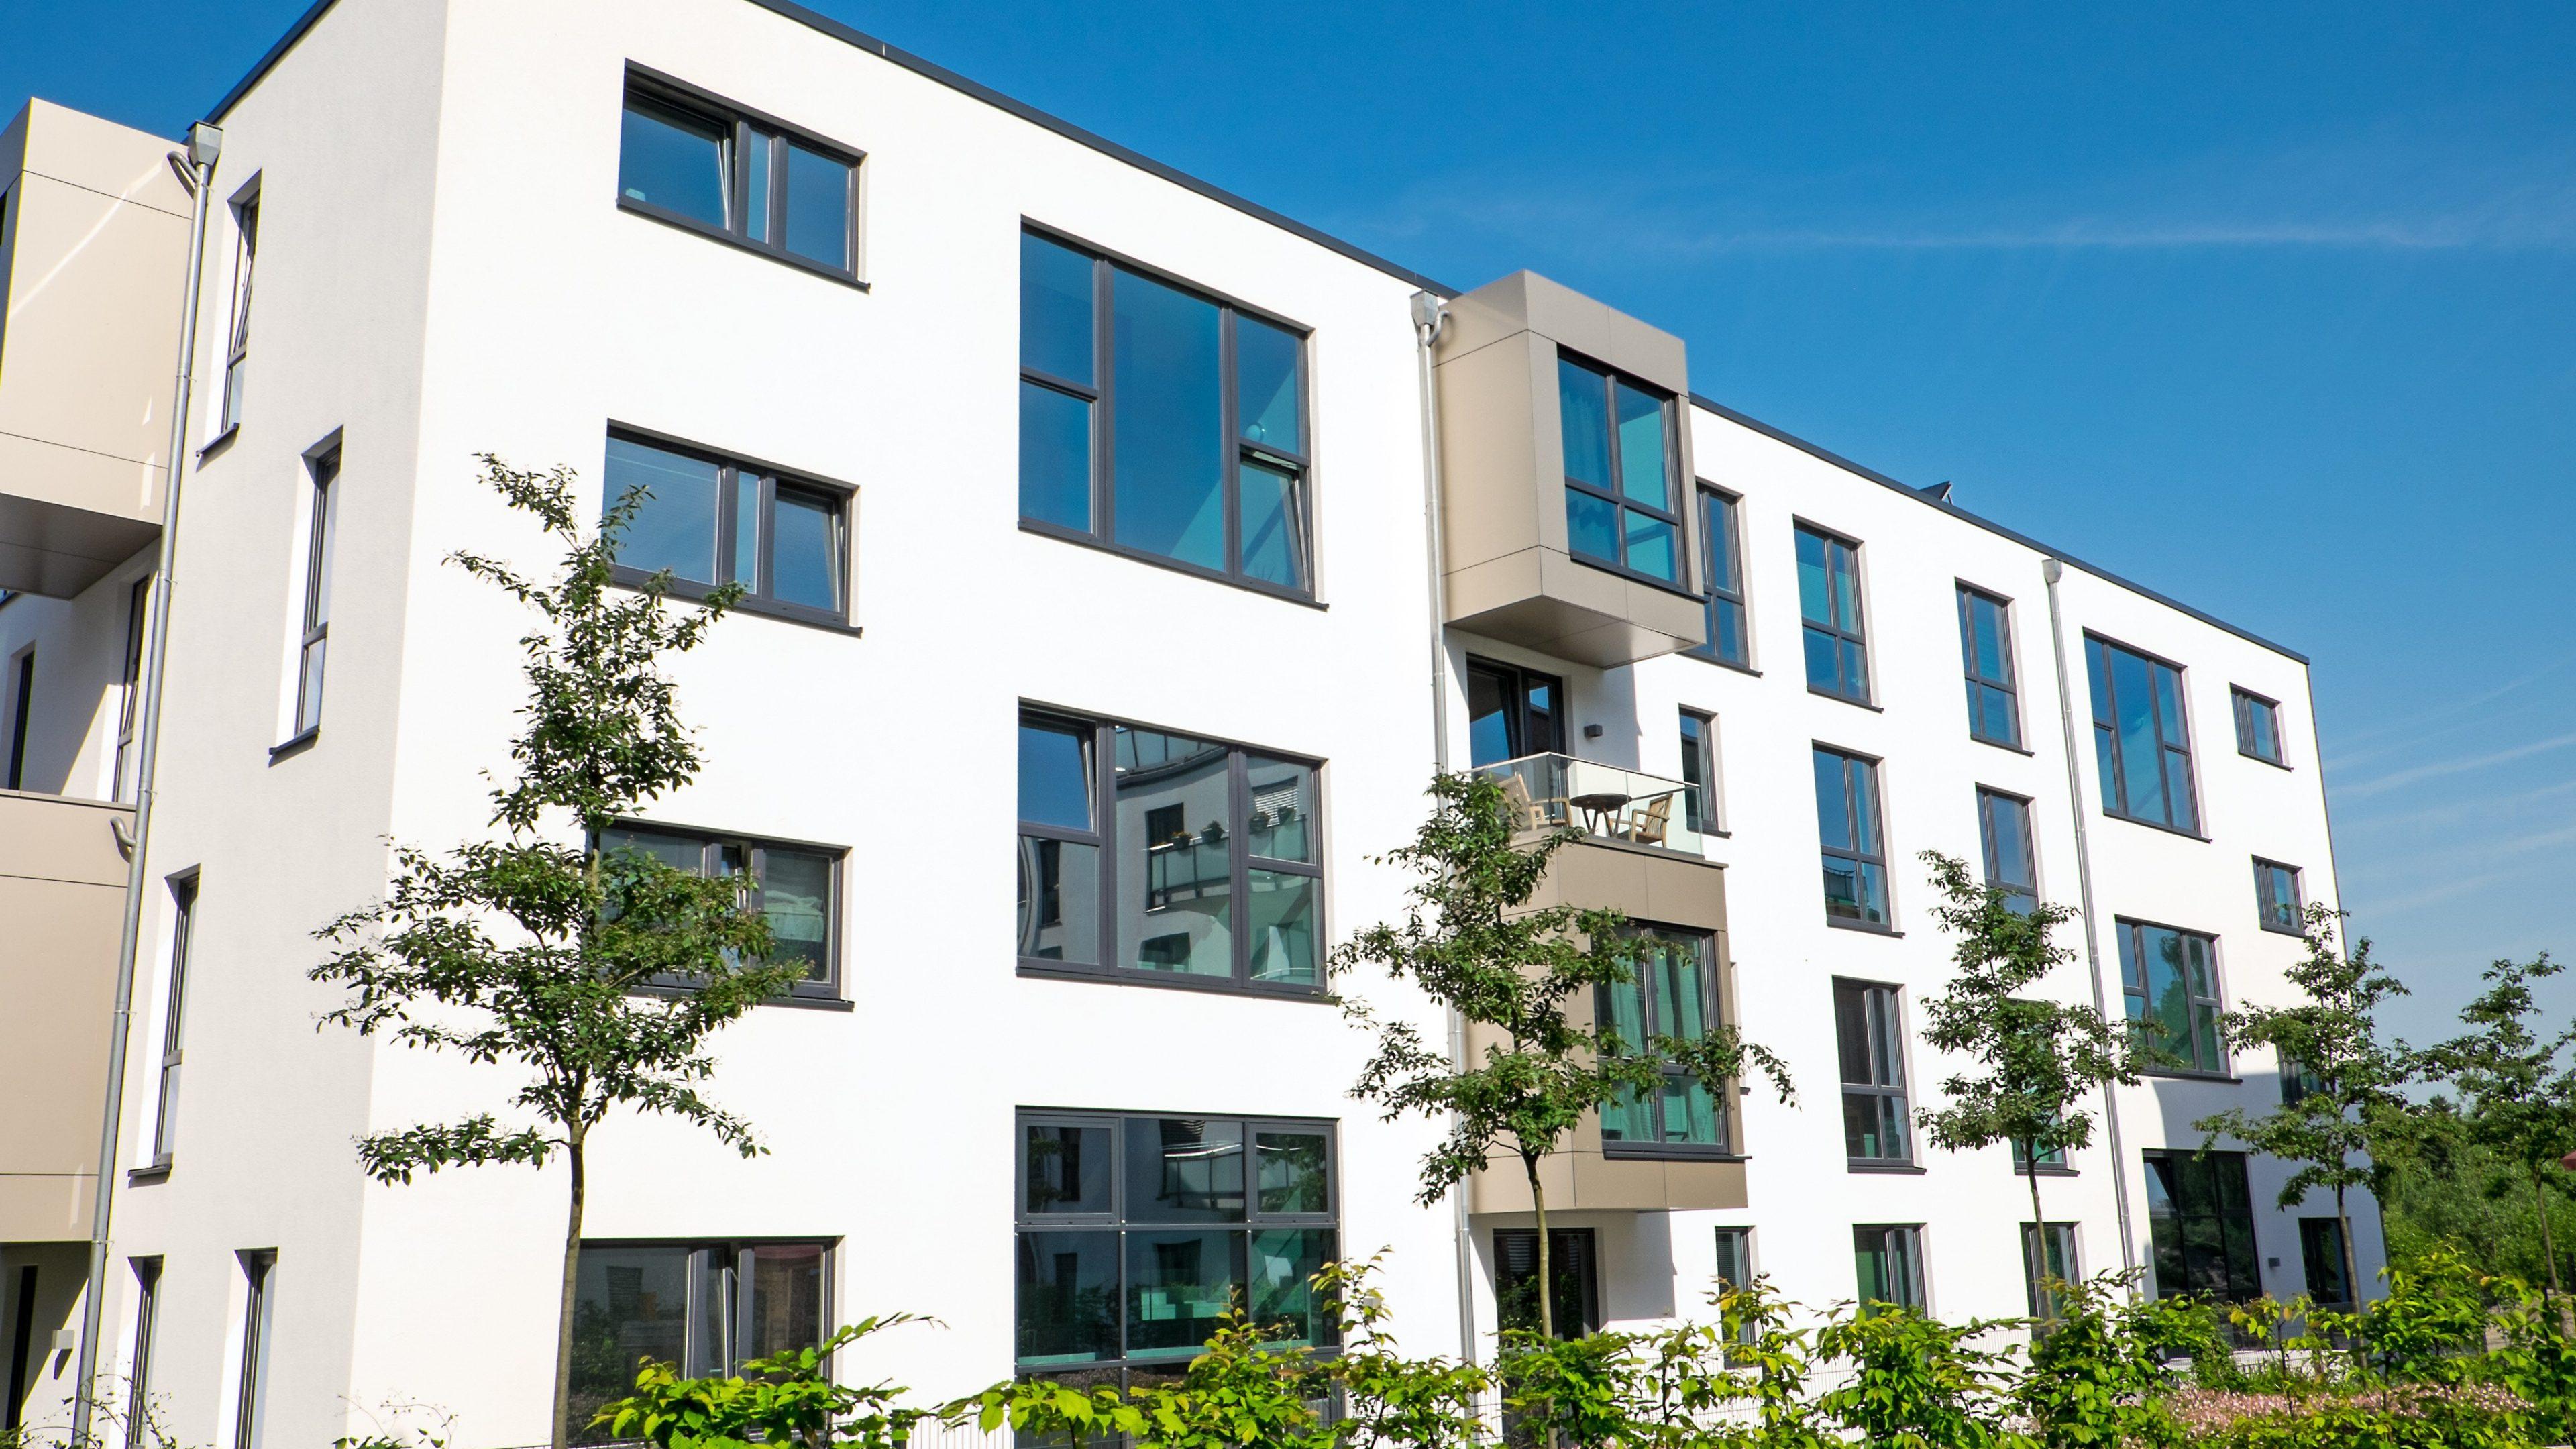 Immobilien in 54646 bettingen switzerland roger pierce binary options scam